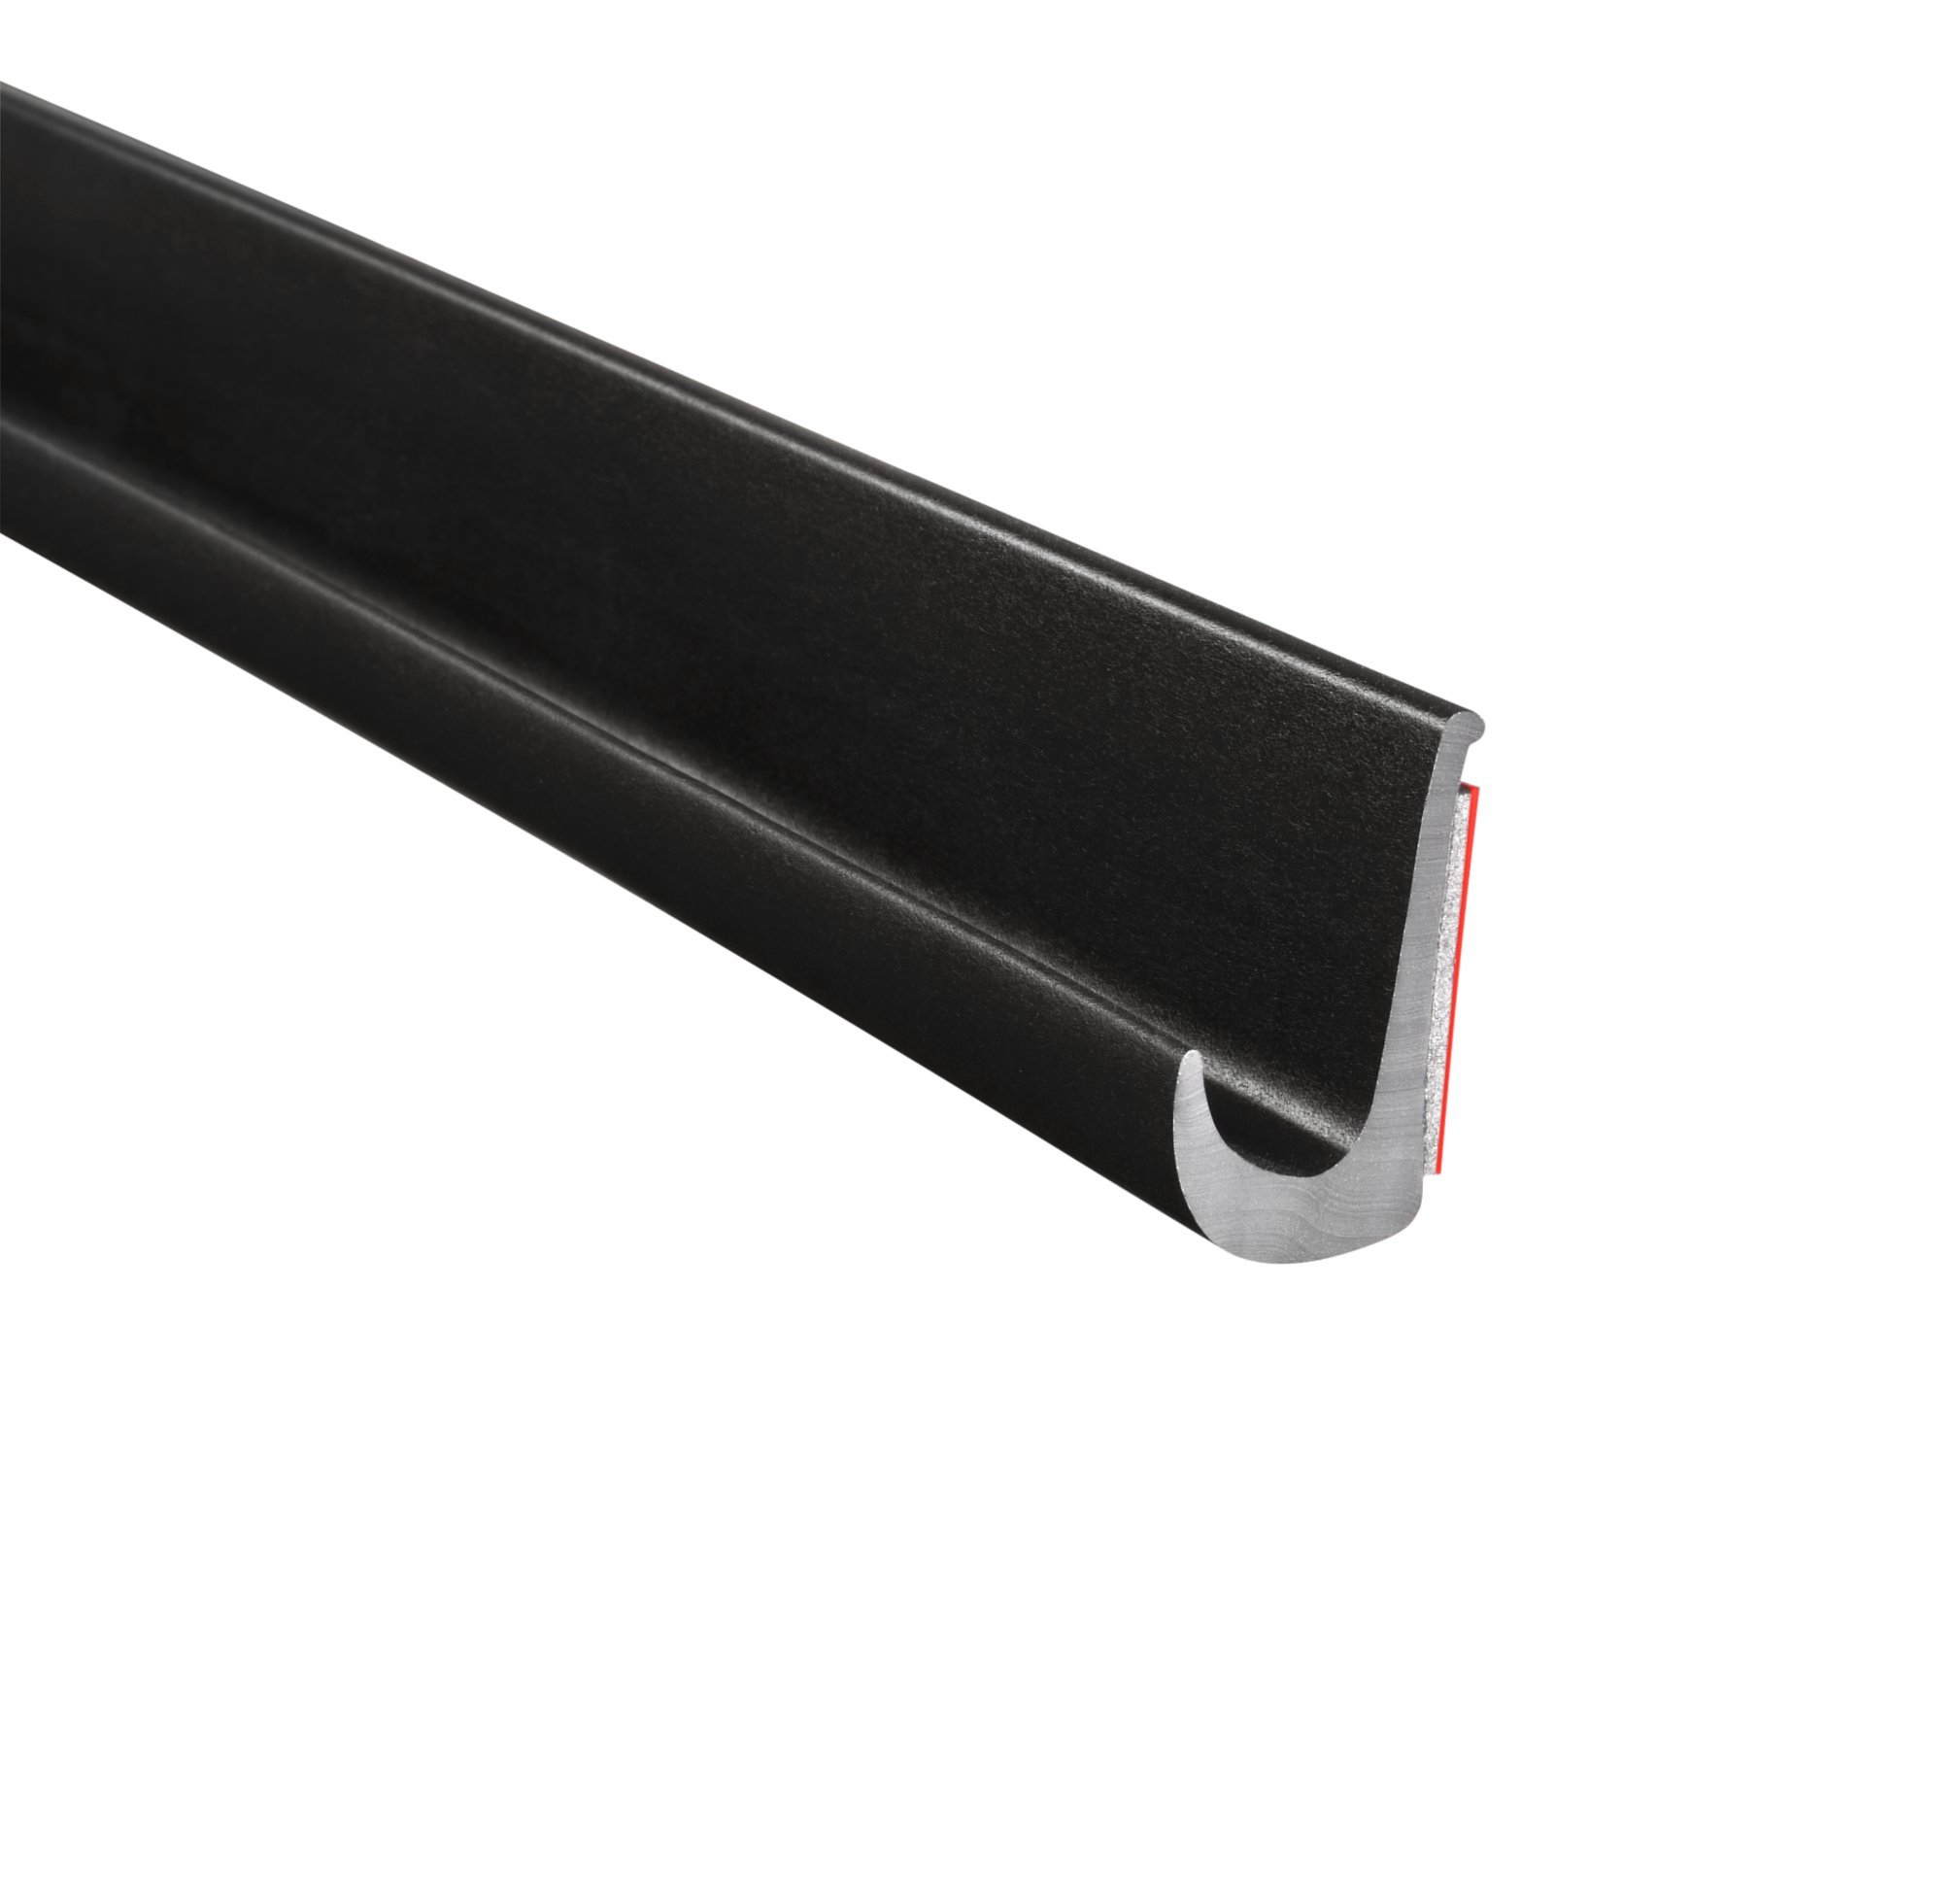 "Trim-Lok Drip Rail – Black, PVC Plastic Rain Gutter for Cars, Vans, and RVs – Installs with Durable 3M Tape – 1/2"" Height, 125' Length by Trim-lok"